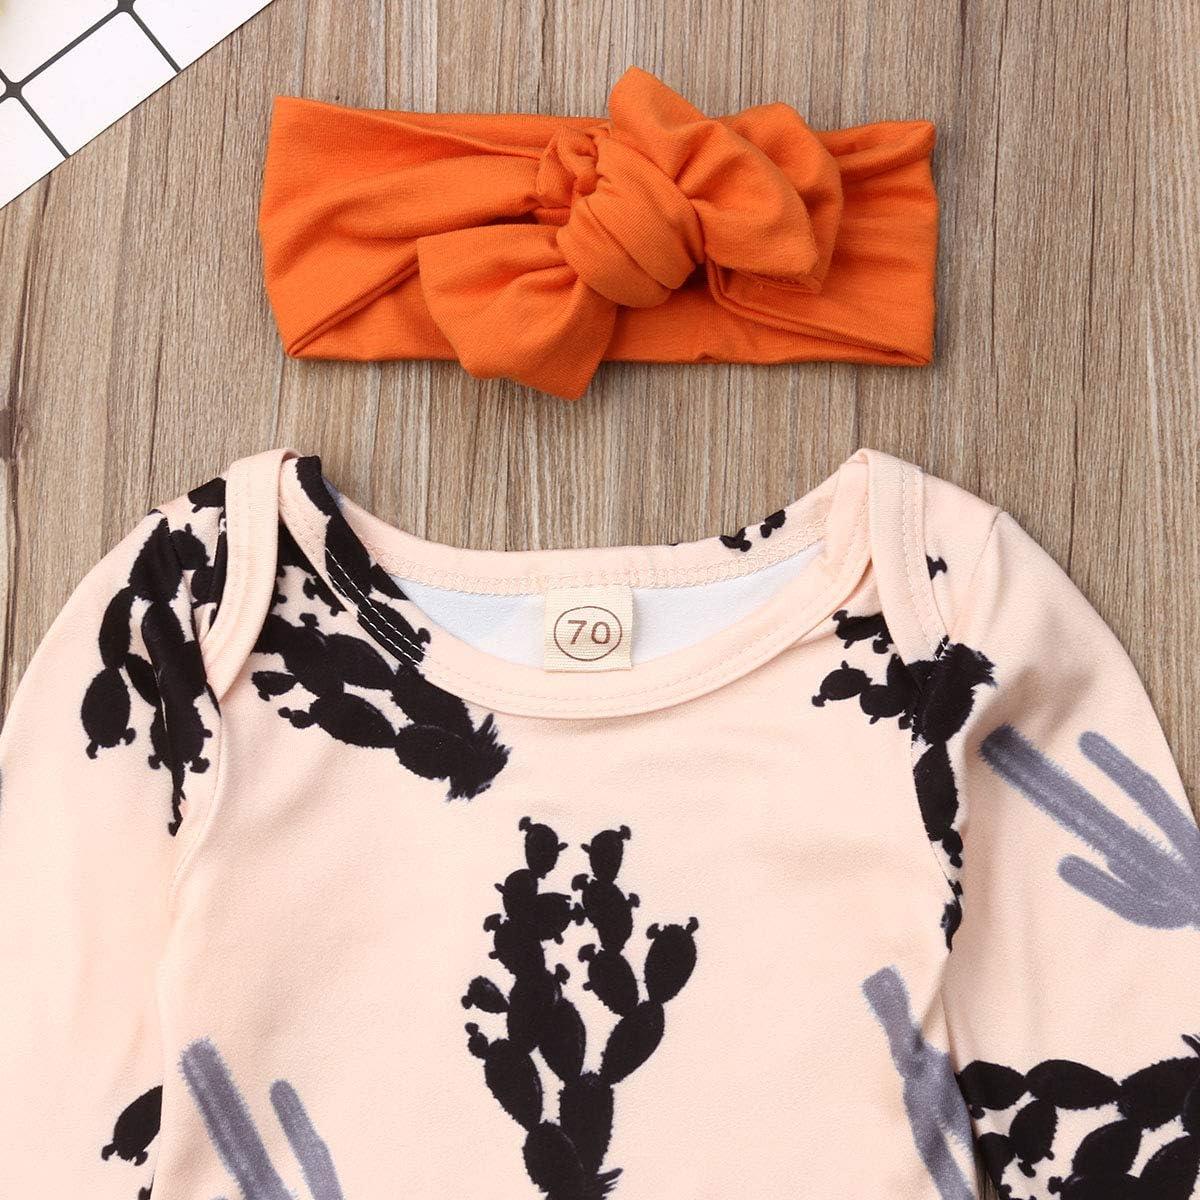 Cacti Cactus Toddler Baby Girls Cotton Ruffle Short Sleeve Top Soft T-Shirt 2-6T